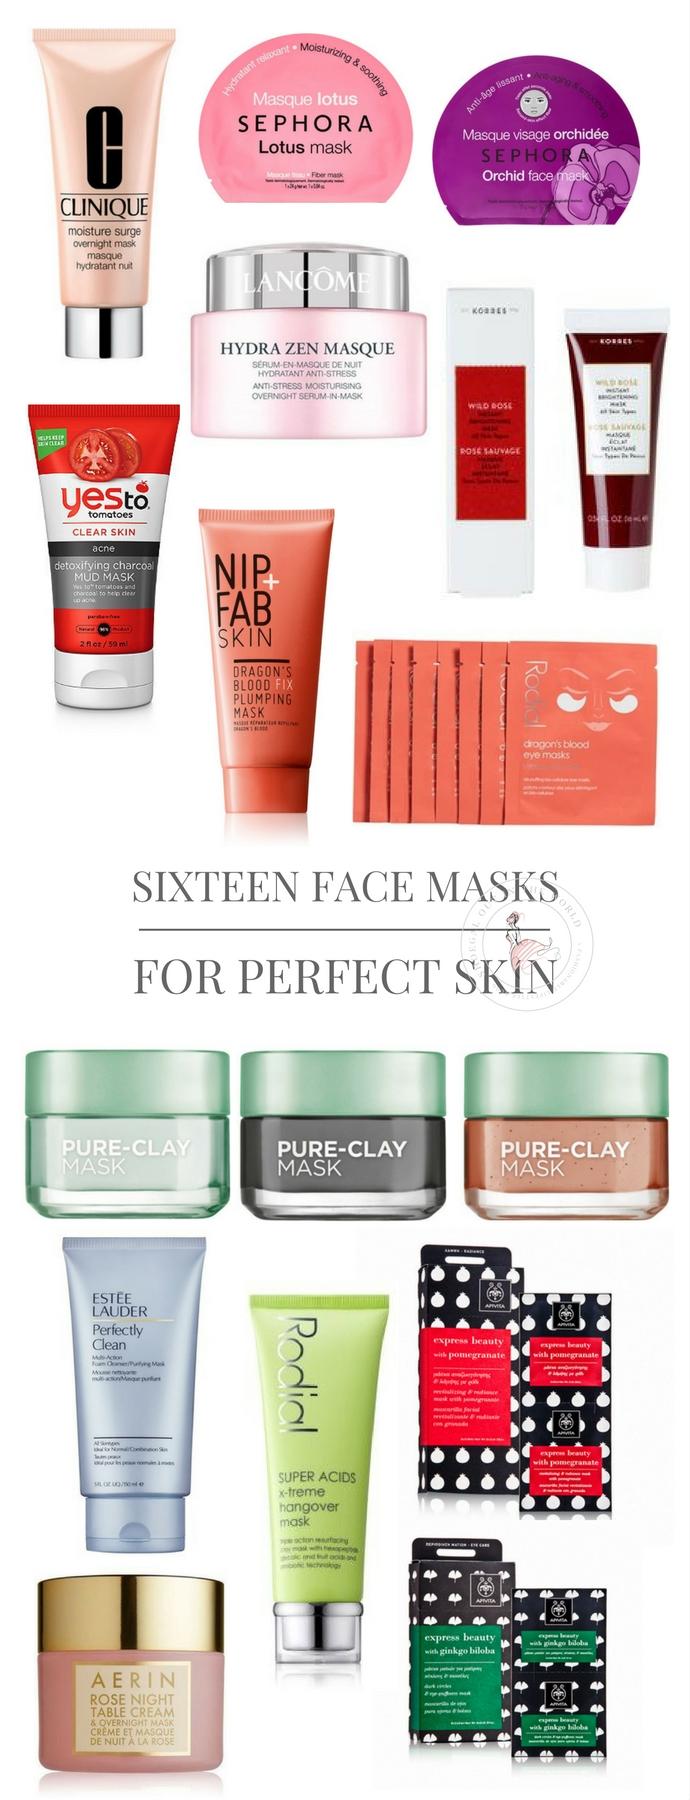 Sixteen Face Maska for Perfect Skin